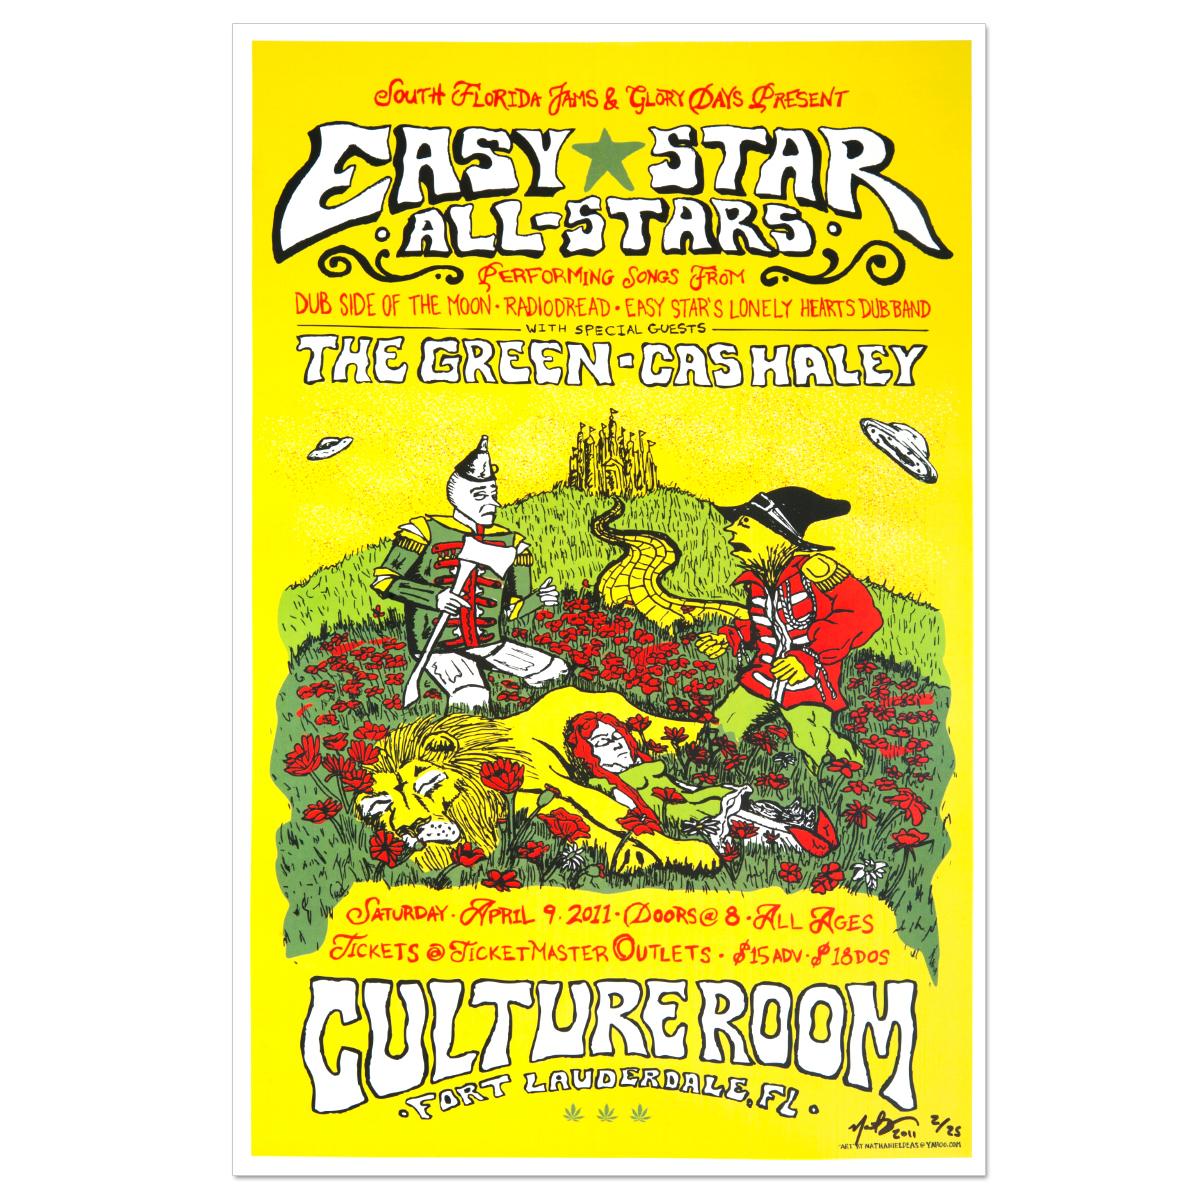 Easy Star All-Stars Poster - April 10, 2011 - Fort Lauderdale